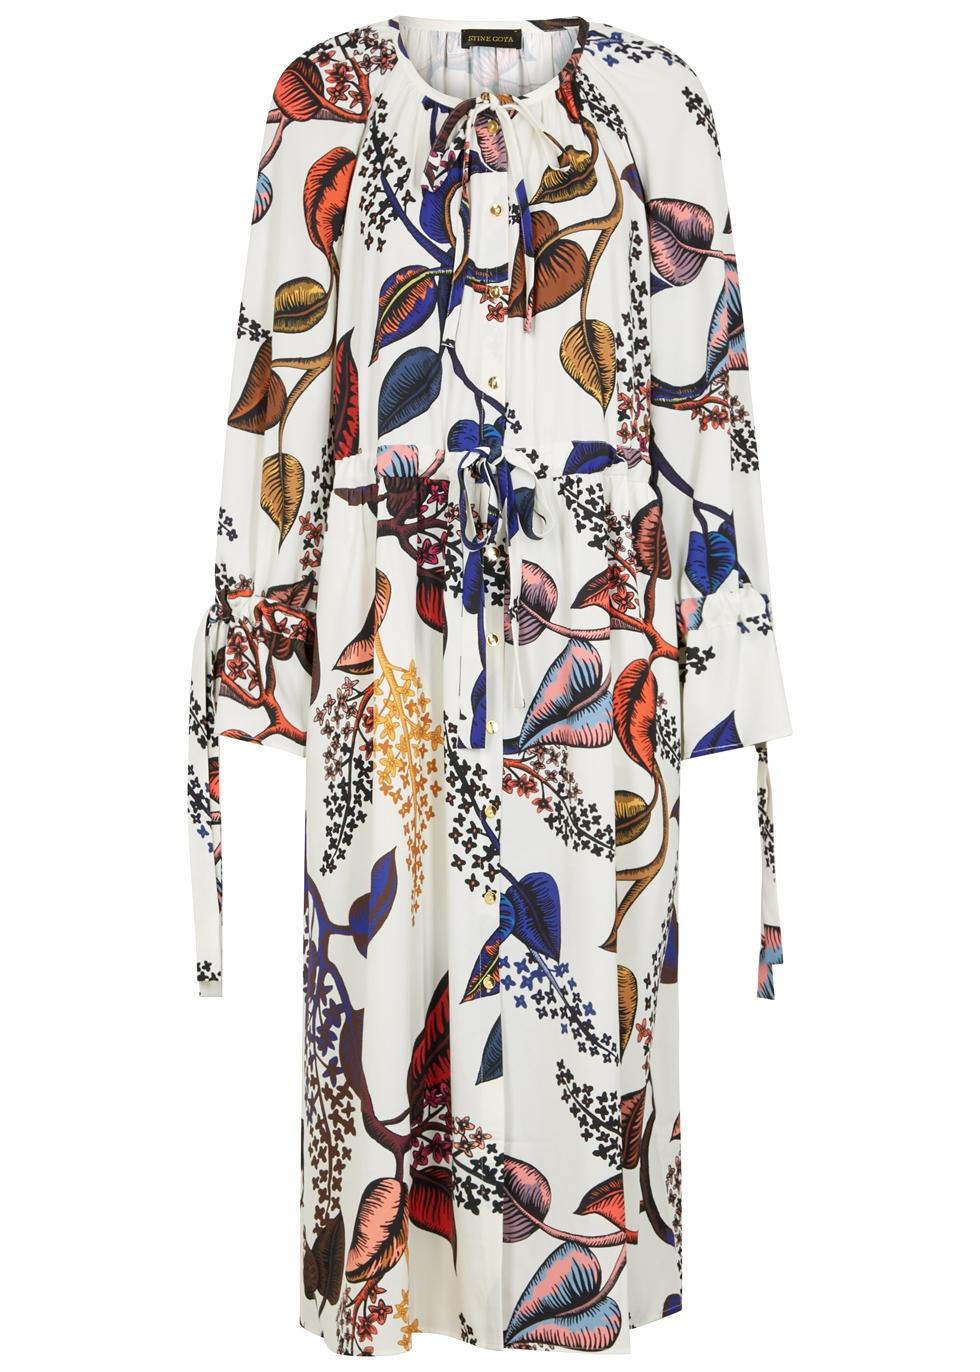 STINE GOYA JACQUES PRINTED SHIRT DRESS